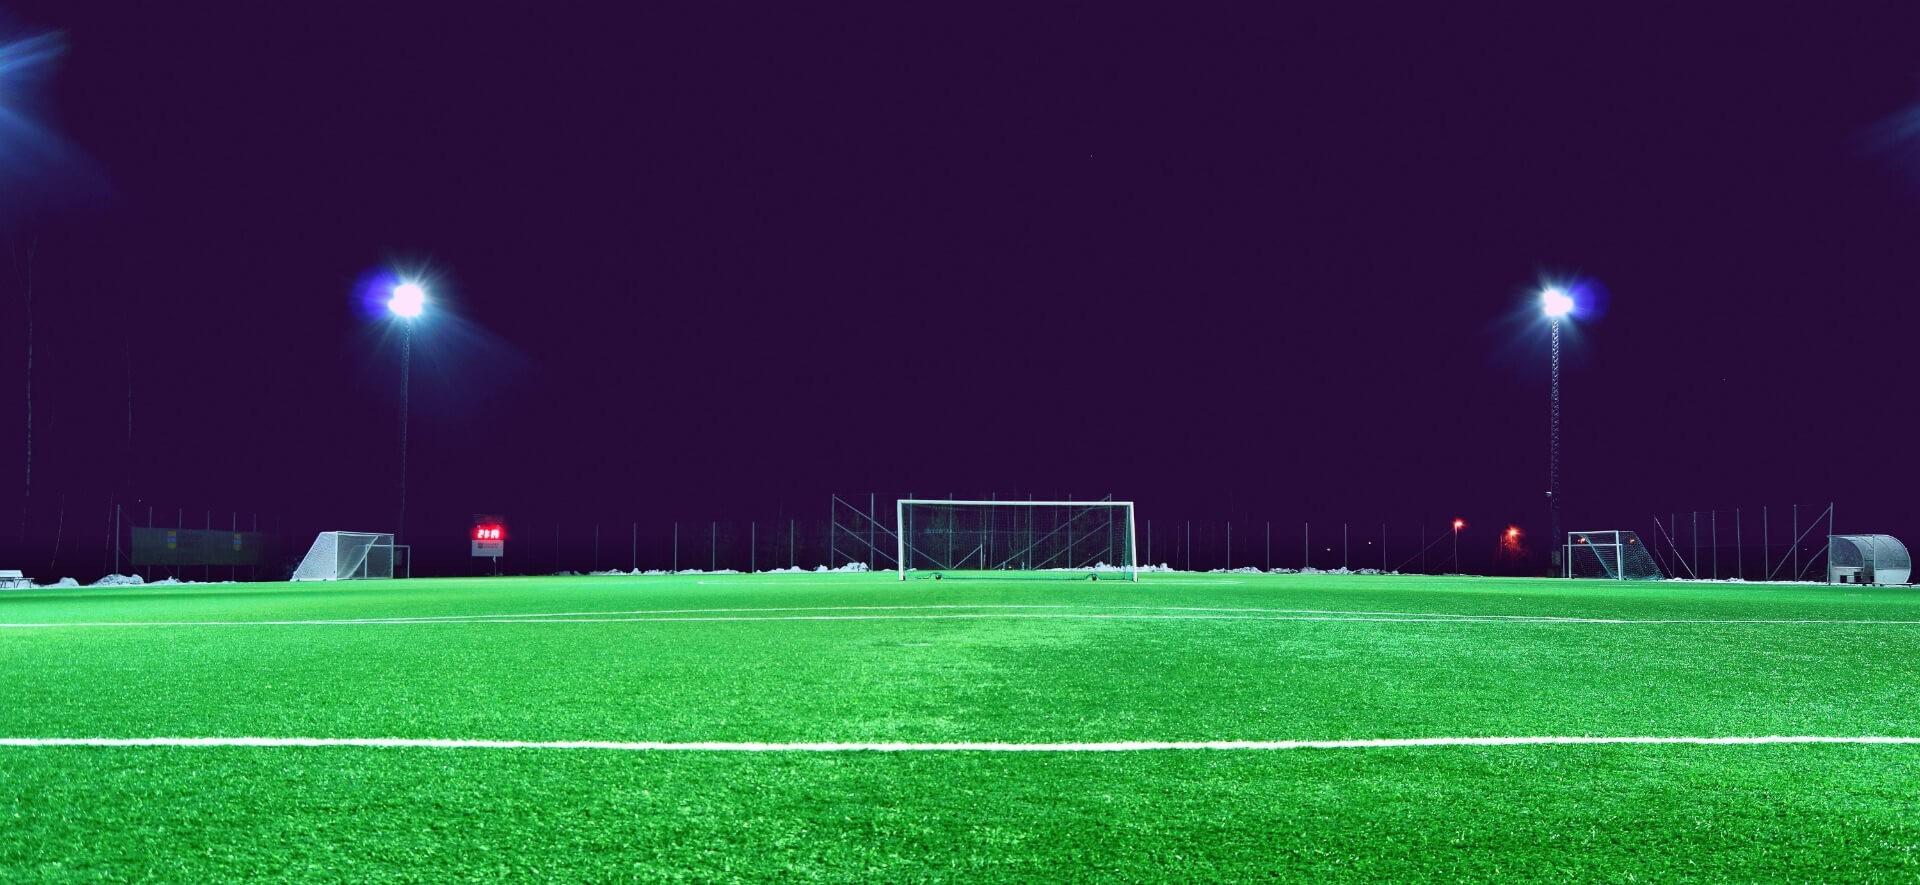 FIFA World Cup 2026